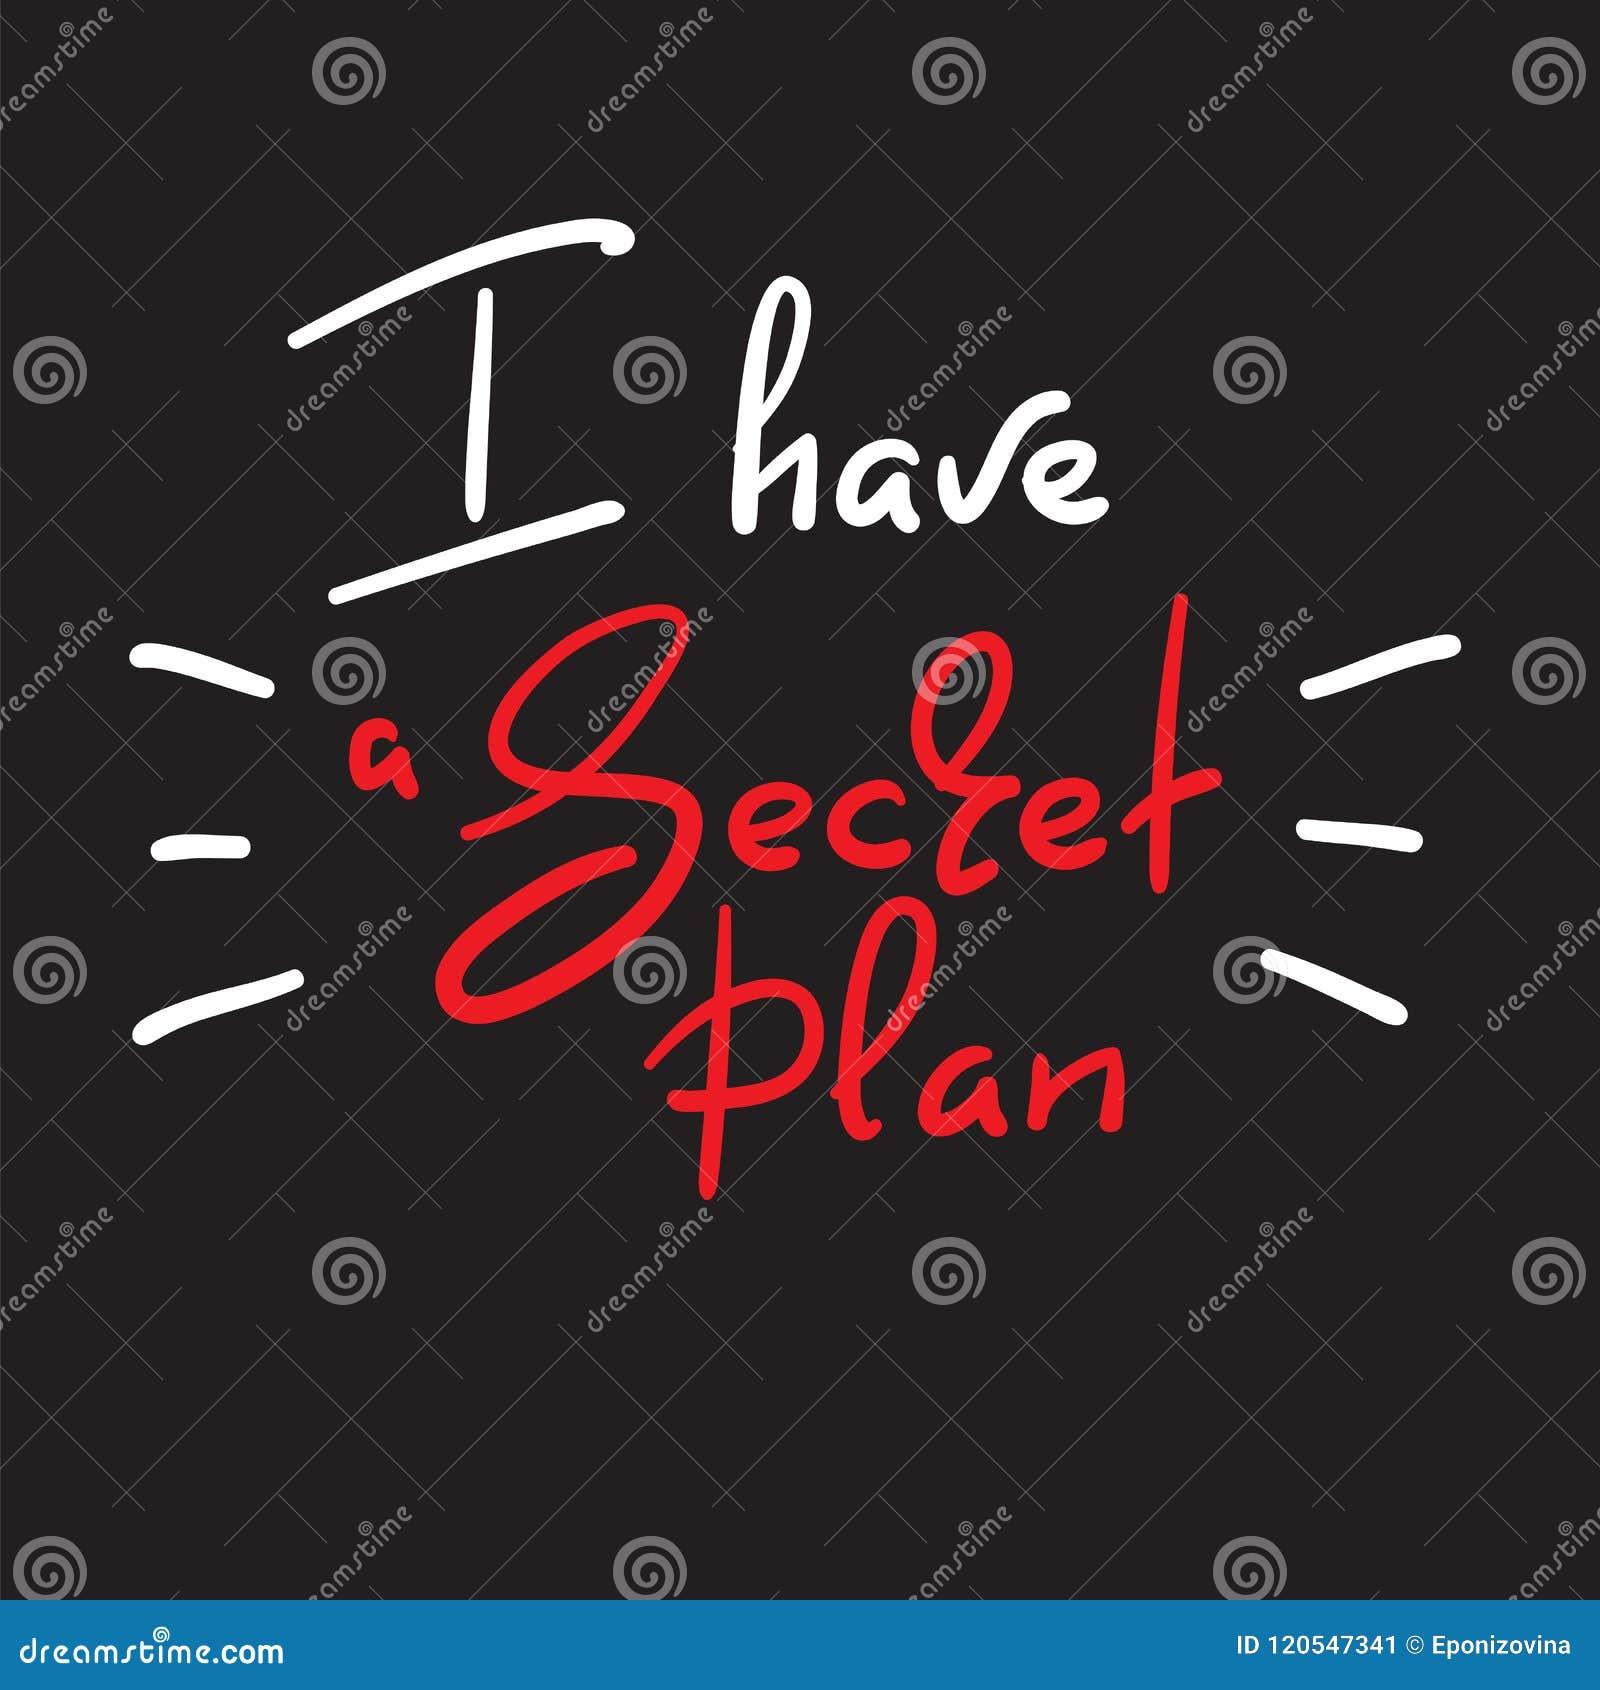 b569580e3633 Έχω ένα μυστικό σχέδιο - χειρόγραφο αστείο απόσπασμα Τυπωμένη ύλη για την  κινητήρια αφίσα έμπνευσης